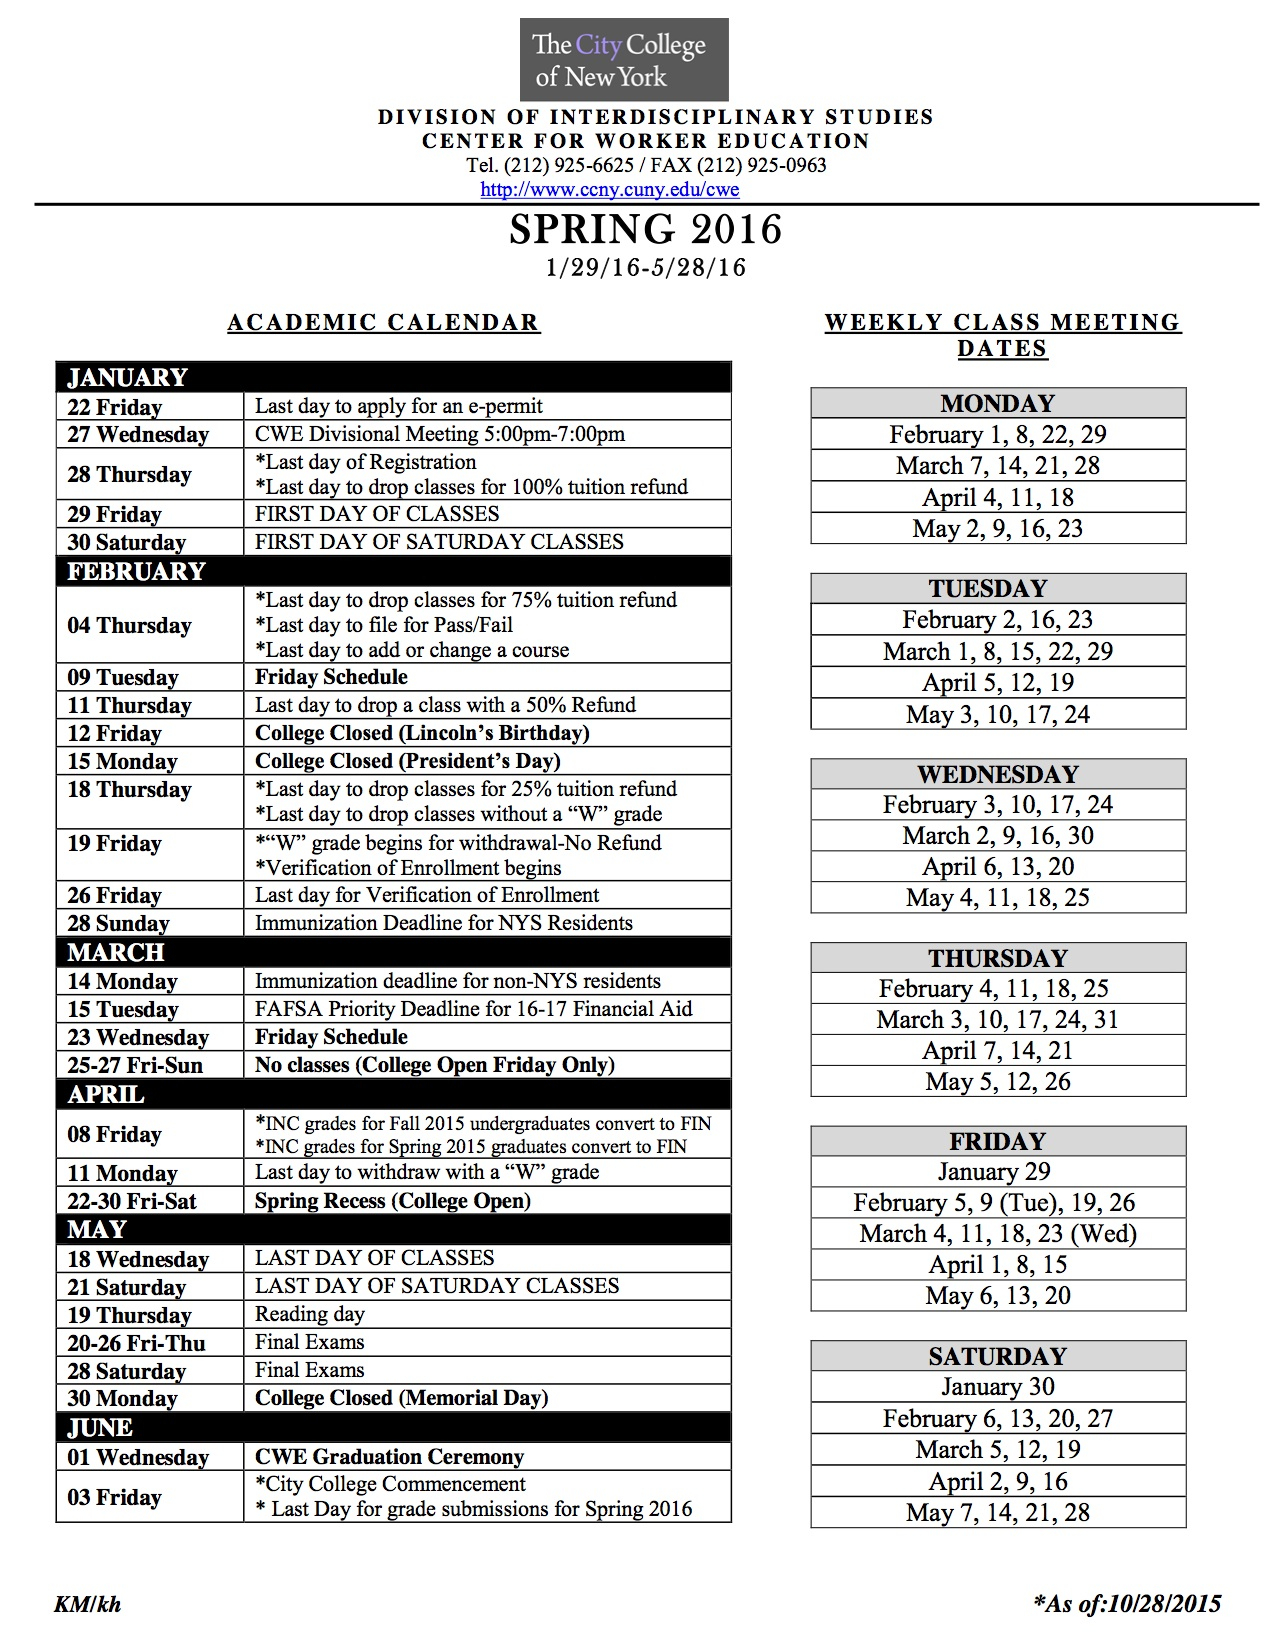 Academic Calendar | The City College Of New York Regarding Staten Island College Callendar